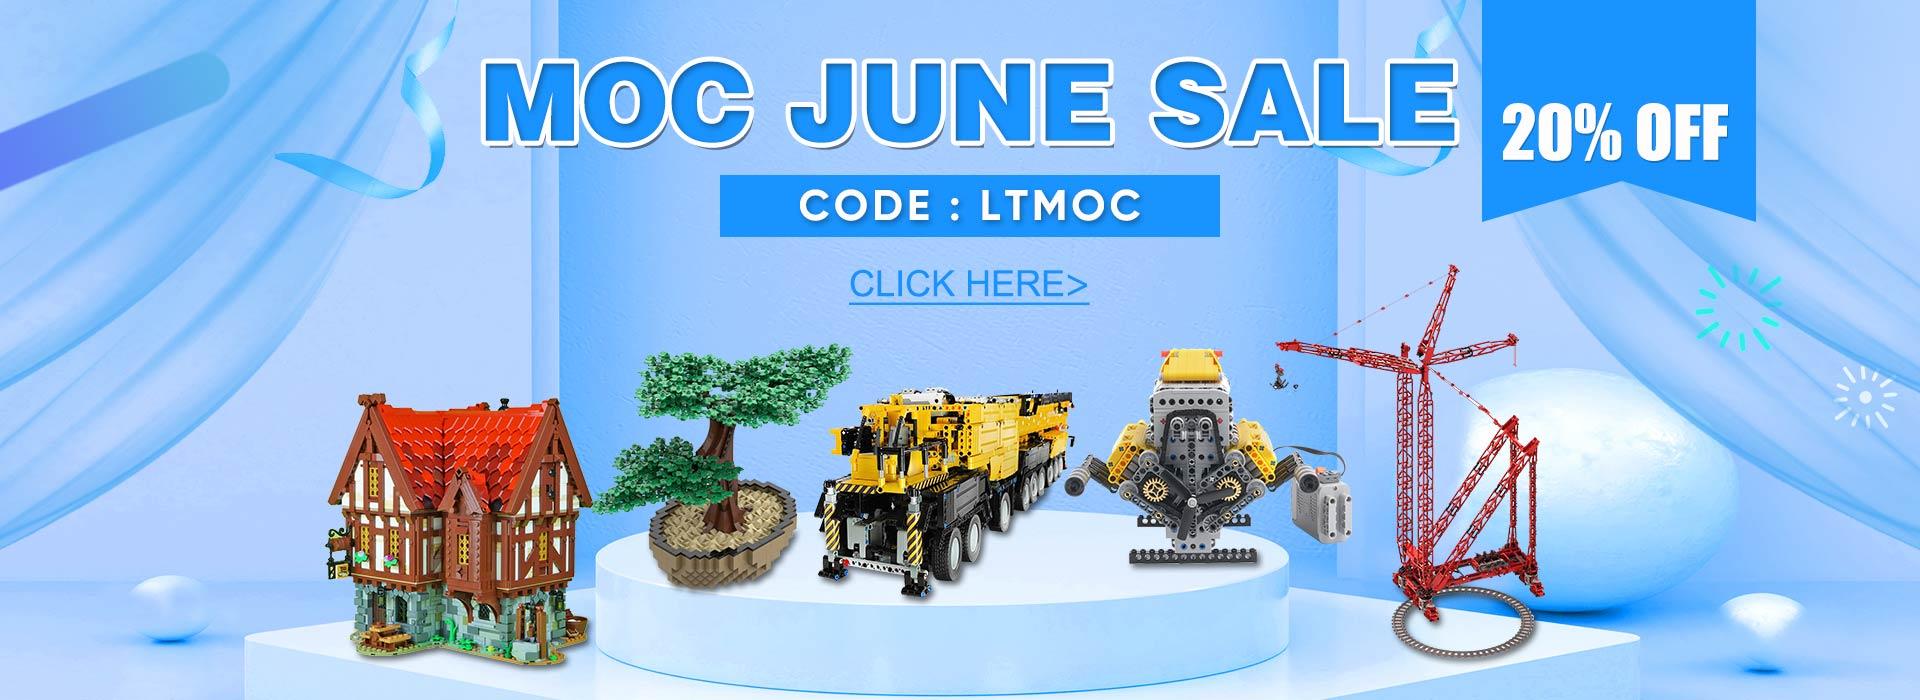 MOCJuneSale - Moc June Sale